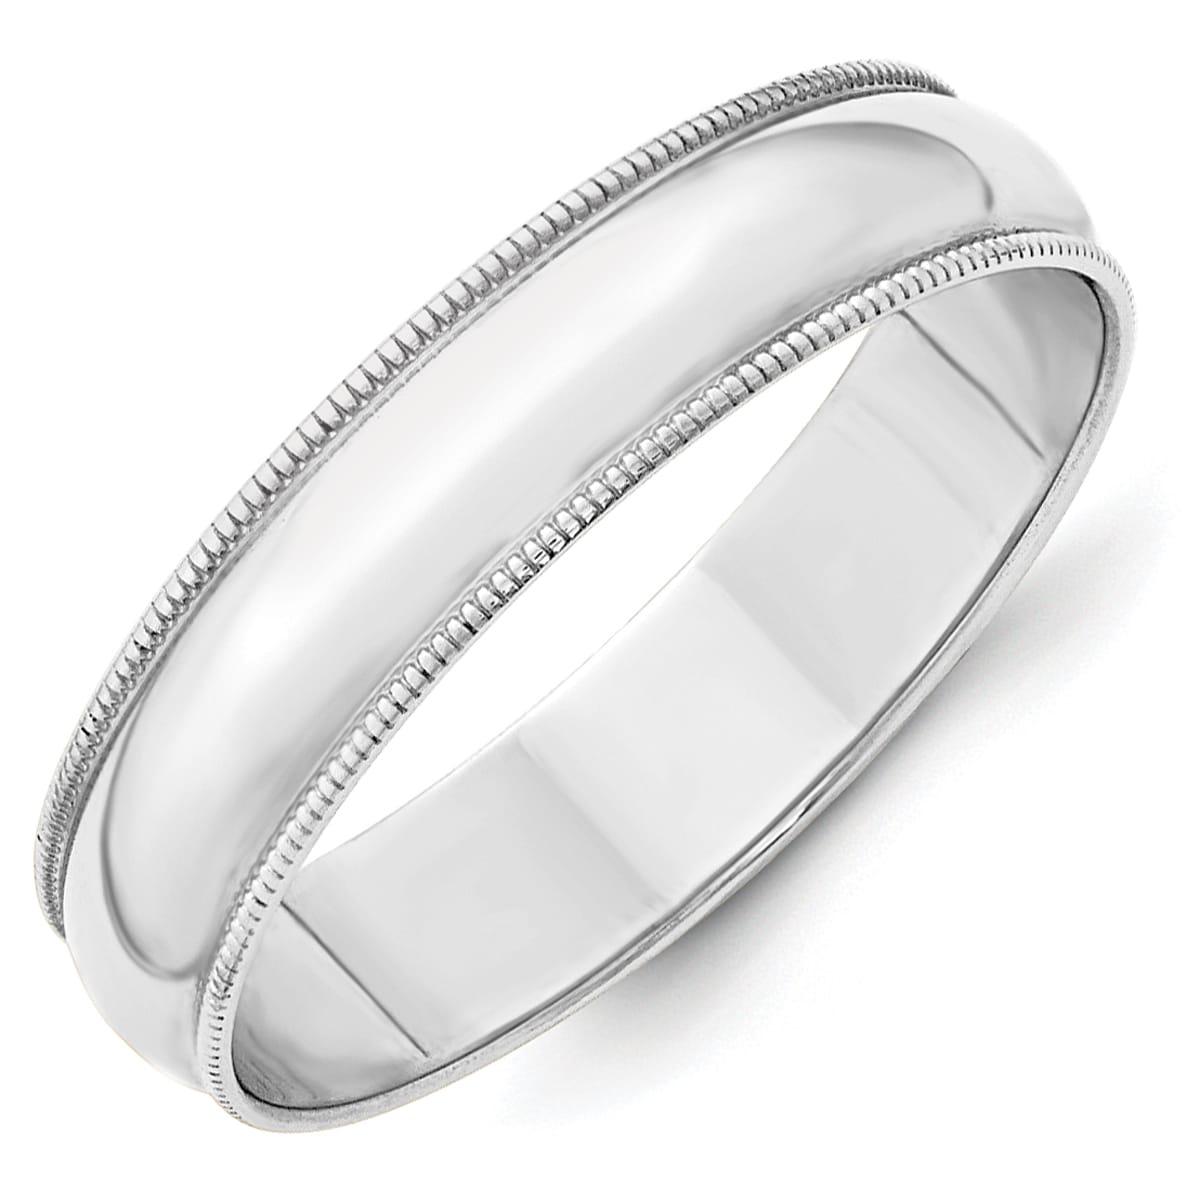 Versil 10 Karat White Gold 5mm Lightweight Milgrain Half Round Band 11 Men S Products Gold Gold Wedding Rings Size 10 Rings